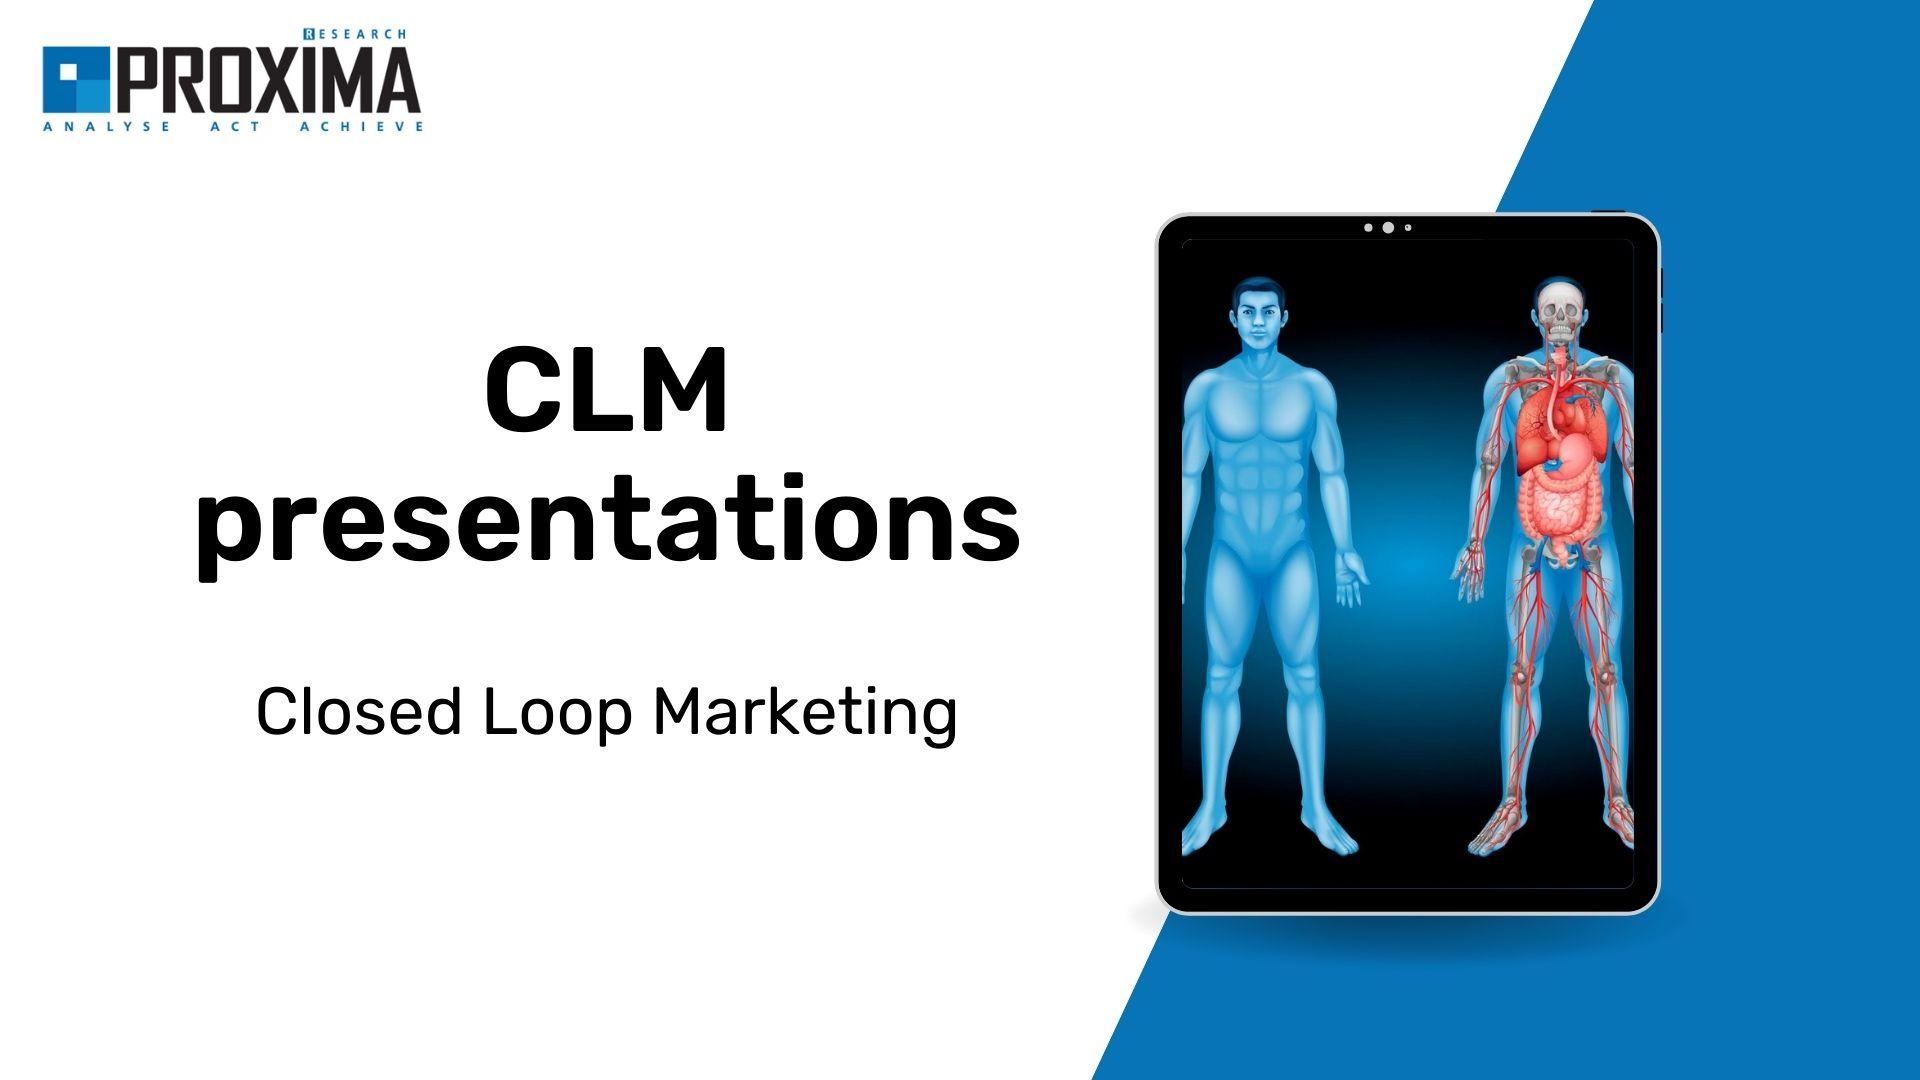 CLM – Closed Loop Marketing